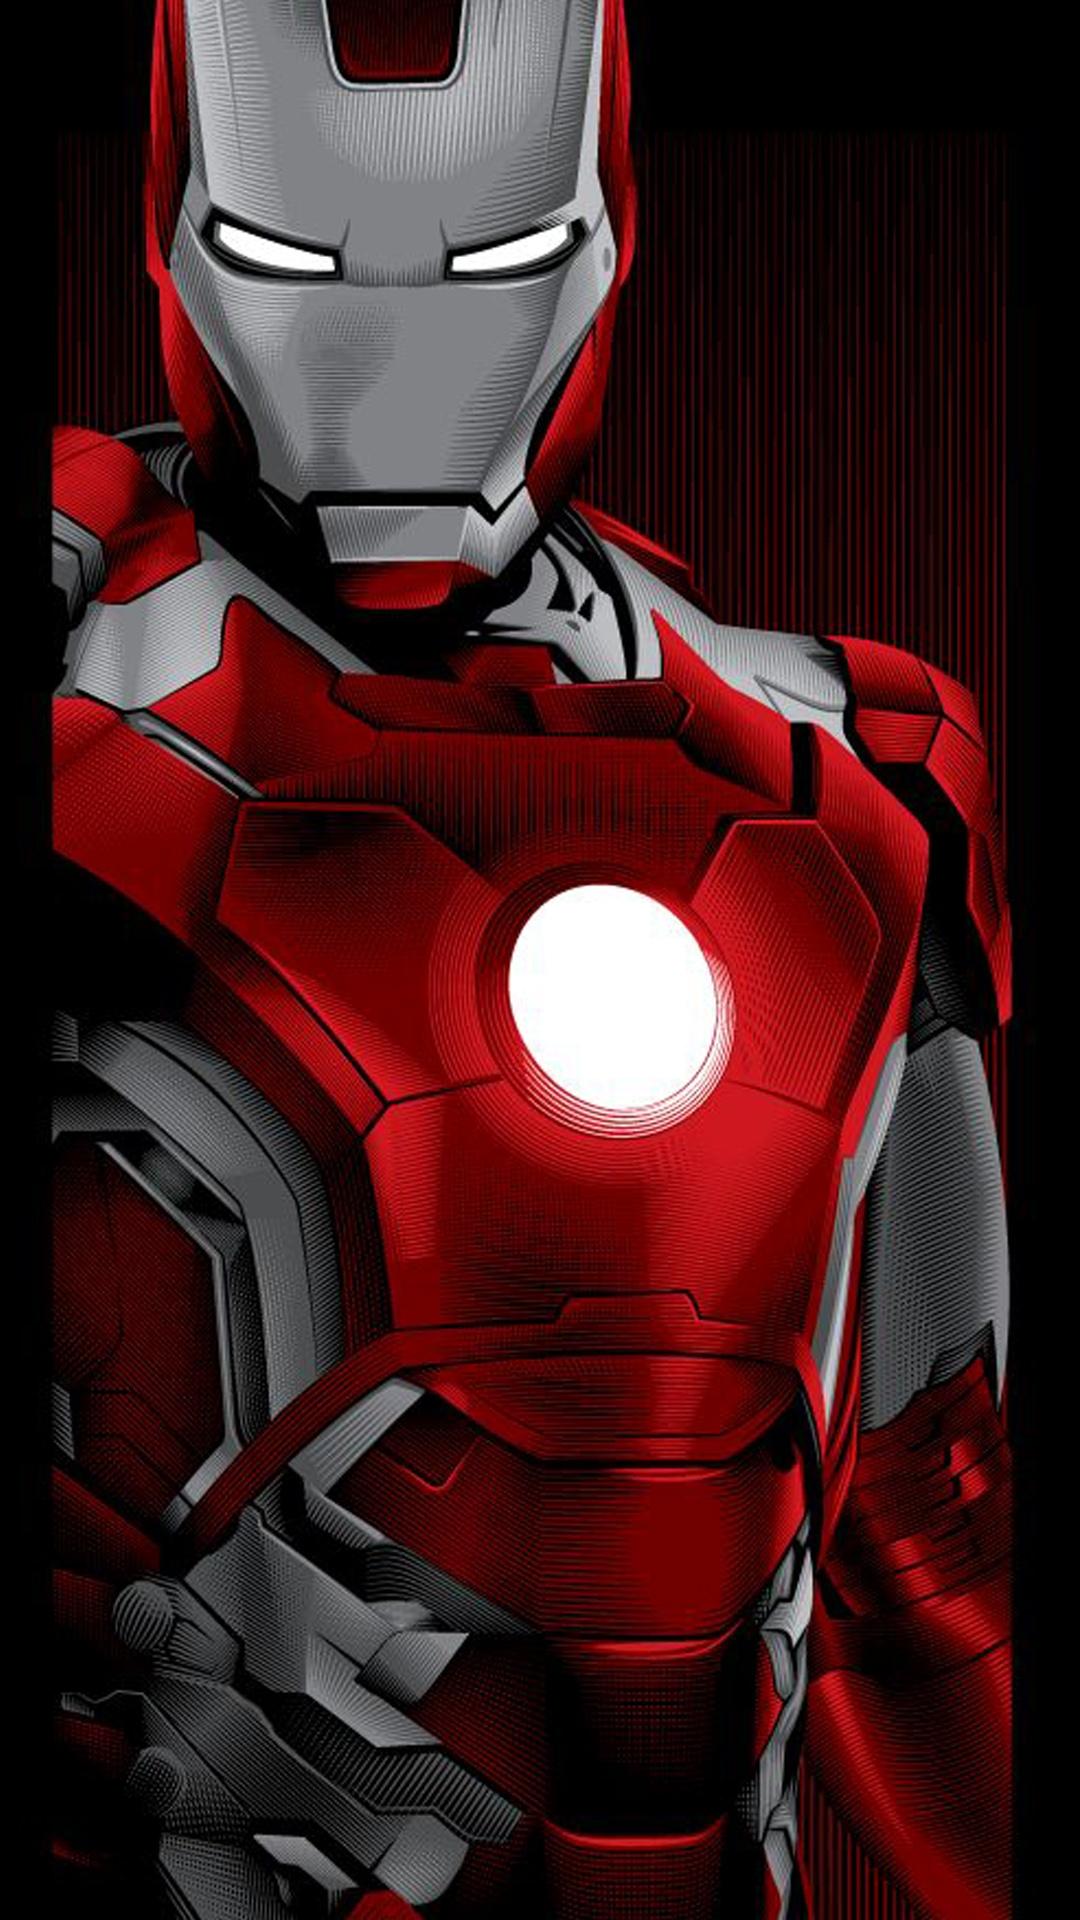 Iron man wallpaper iron man iphone wallpaper iron man for Sfondi iron man